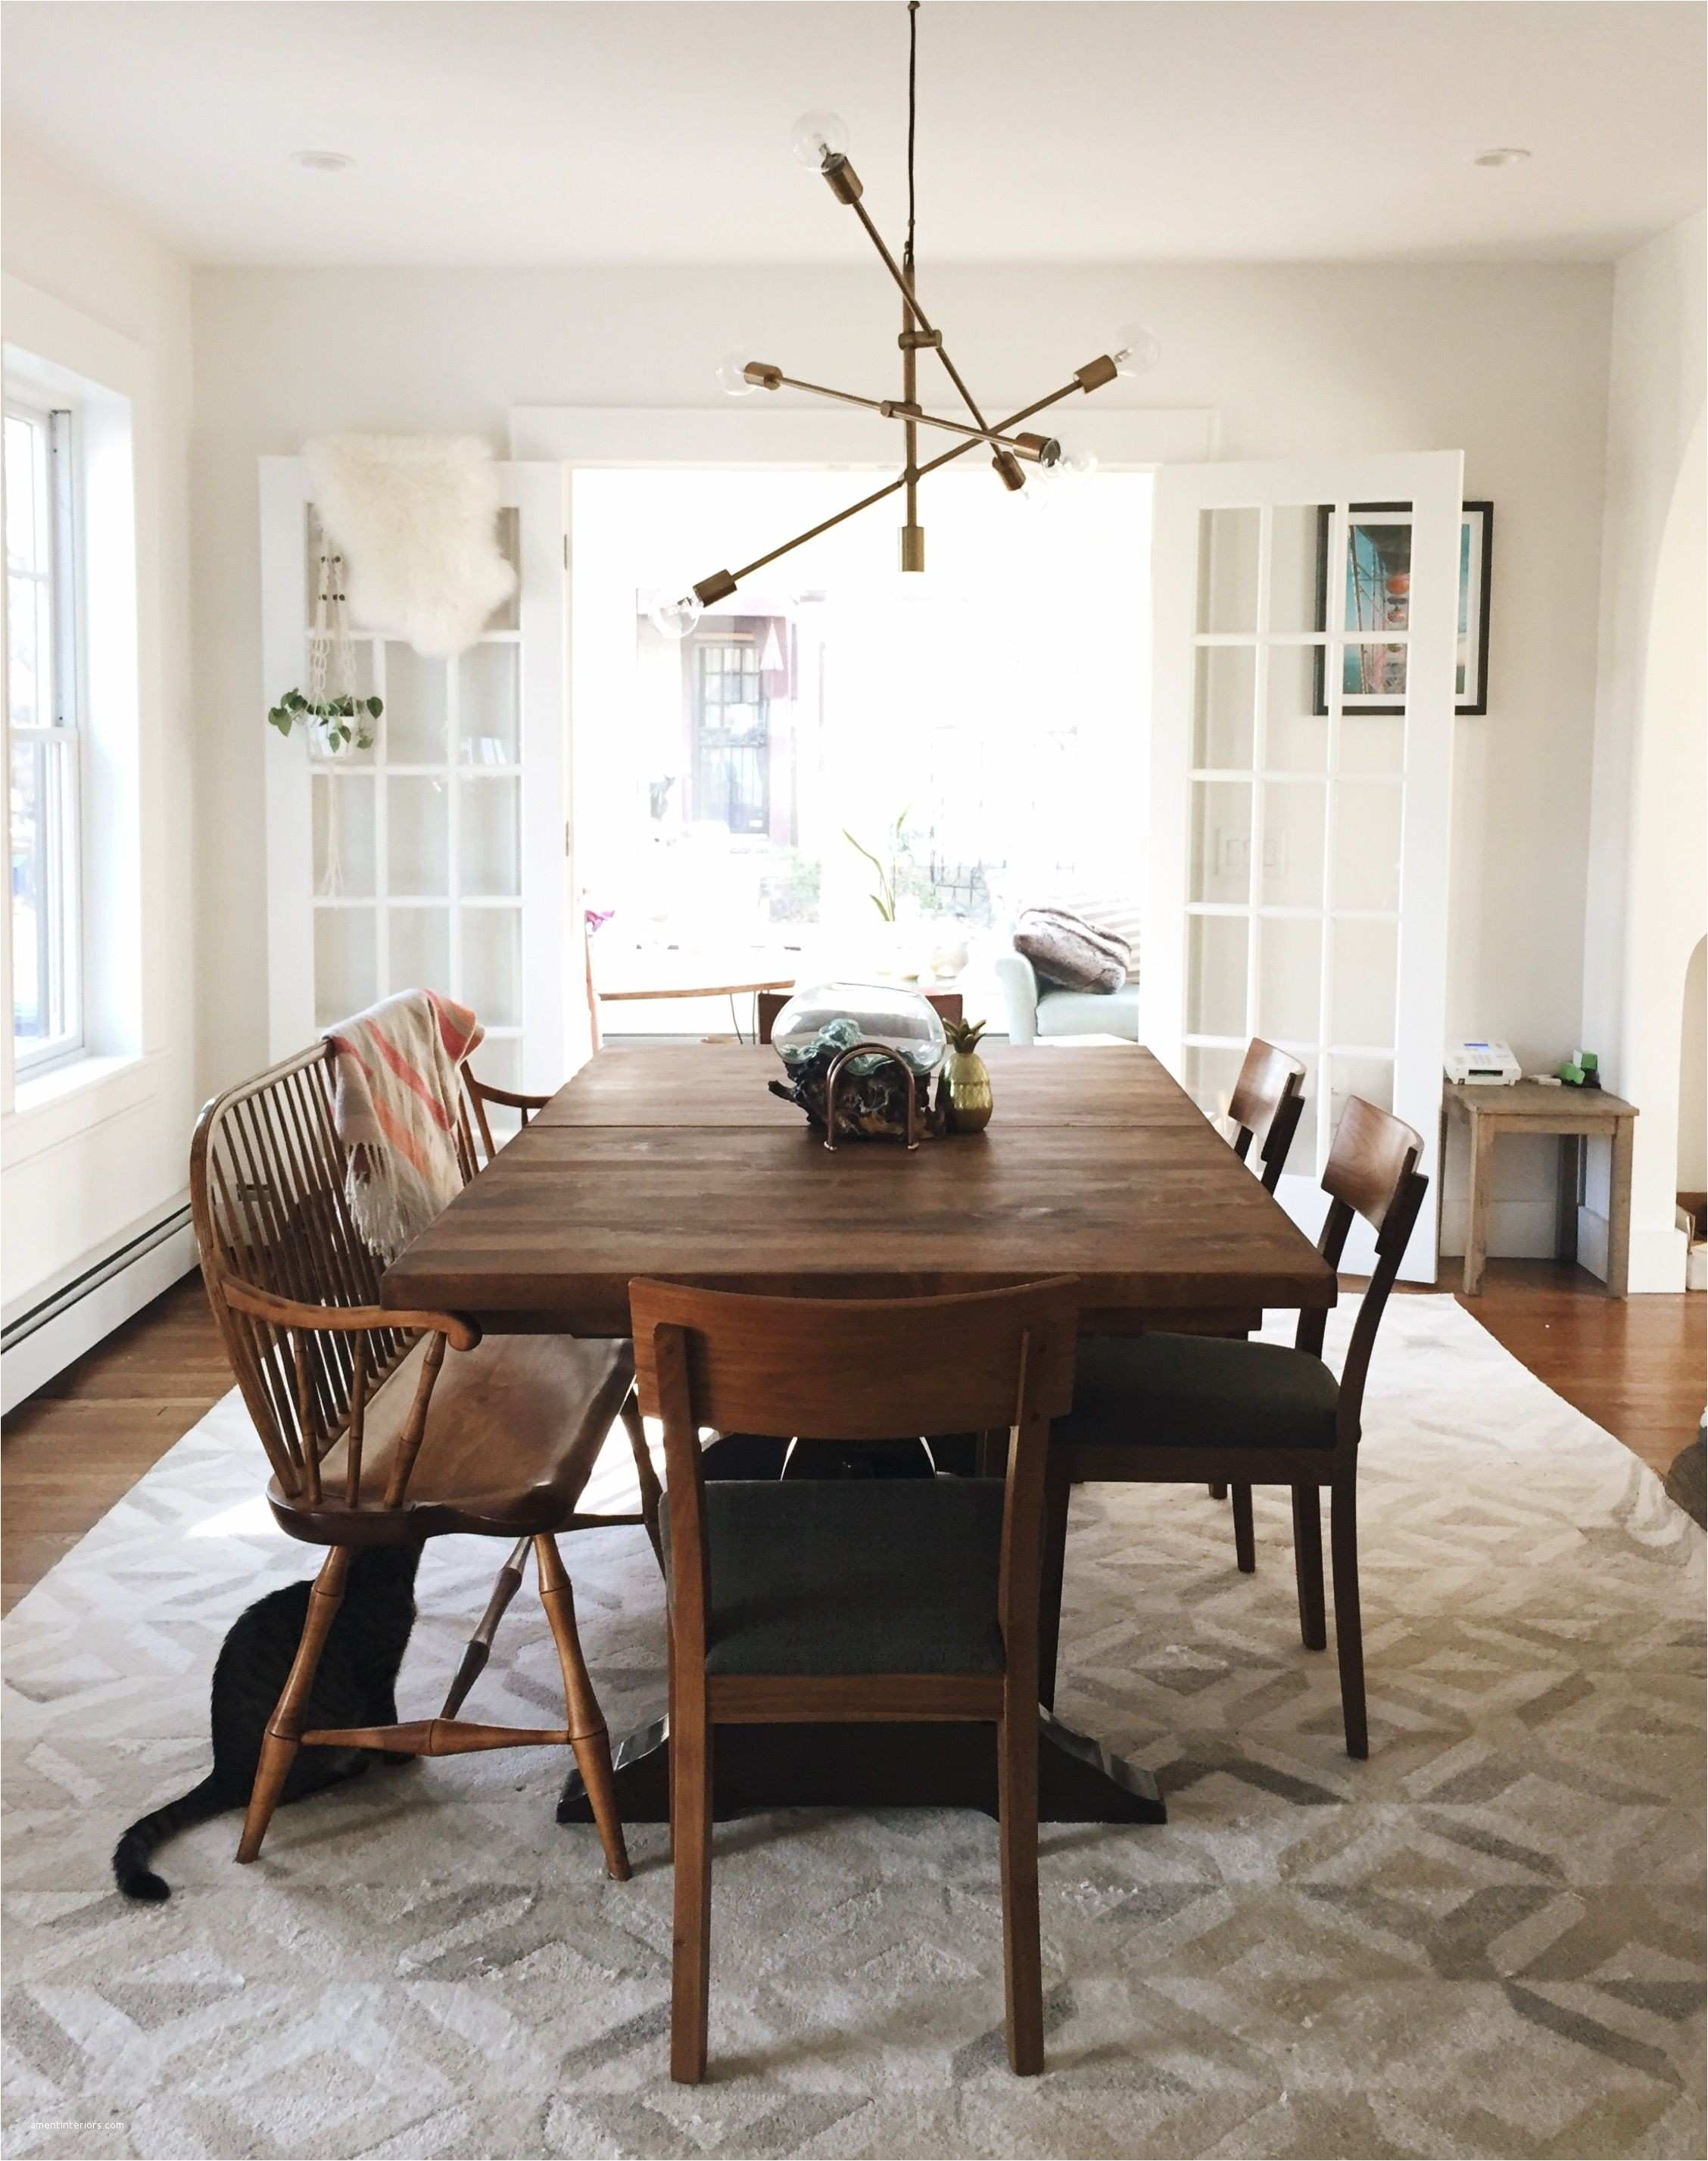 Merveilleux Craigslist Bedroom Furniture Buy Craigslist Dining Table San Antonio  Styling Up Your Desk For